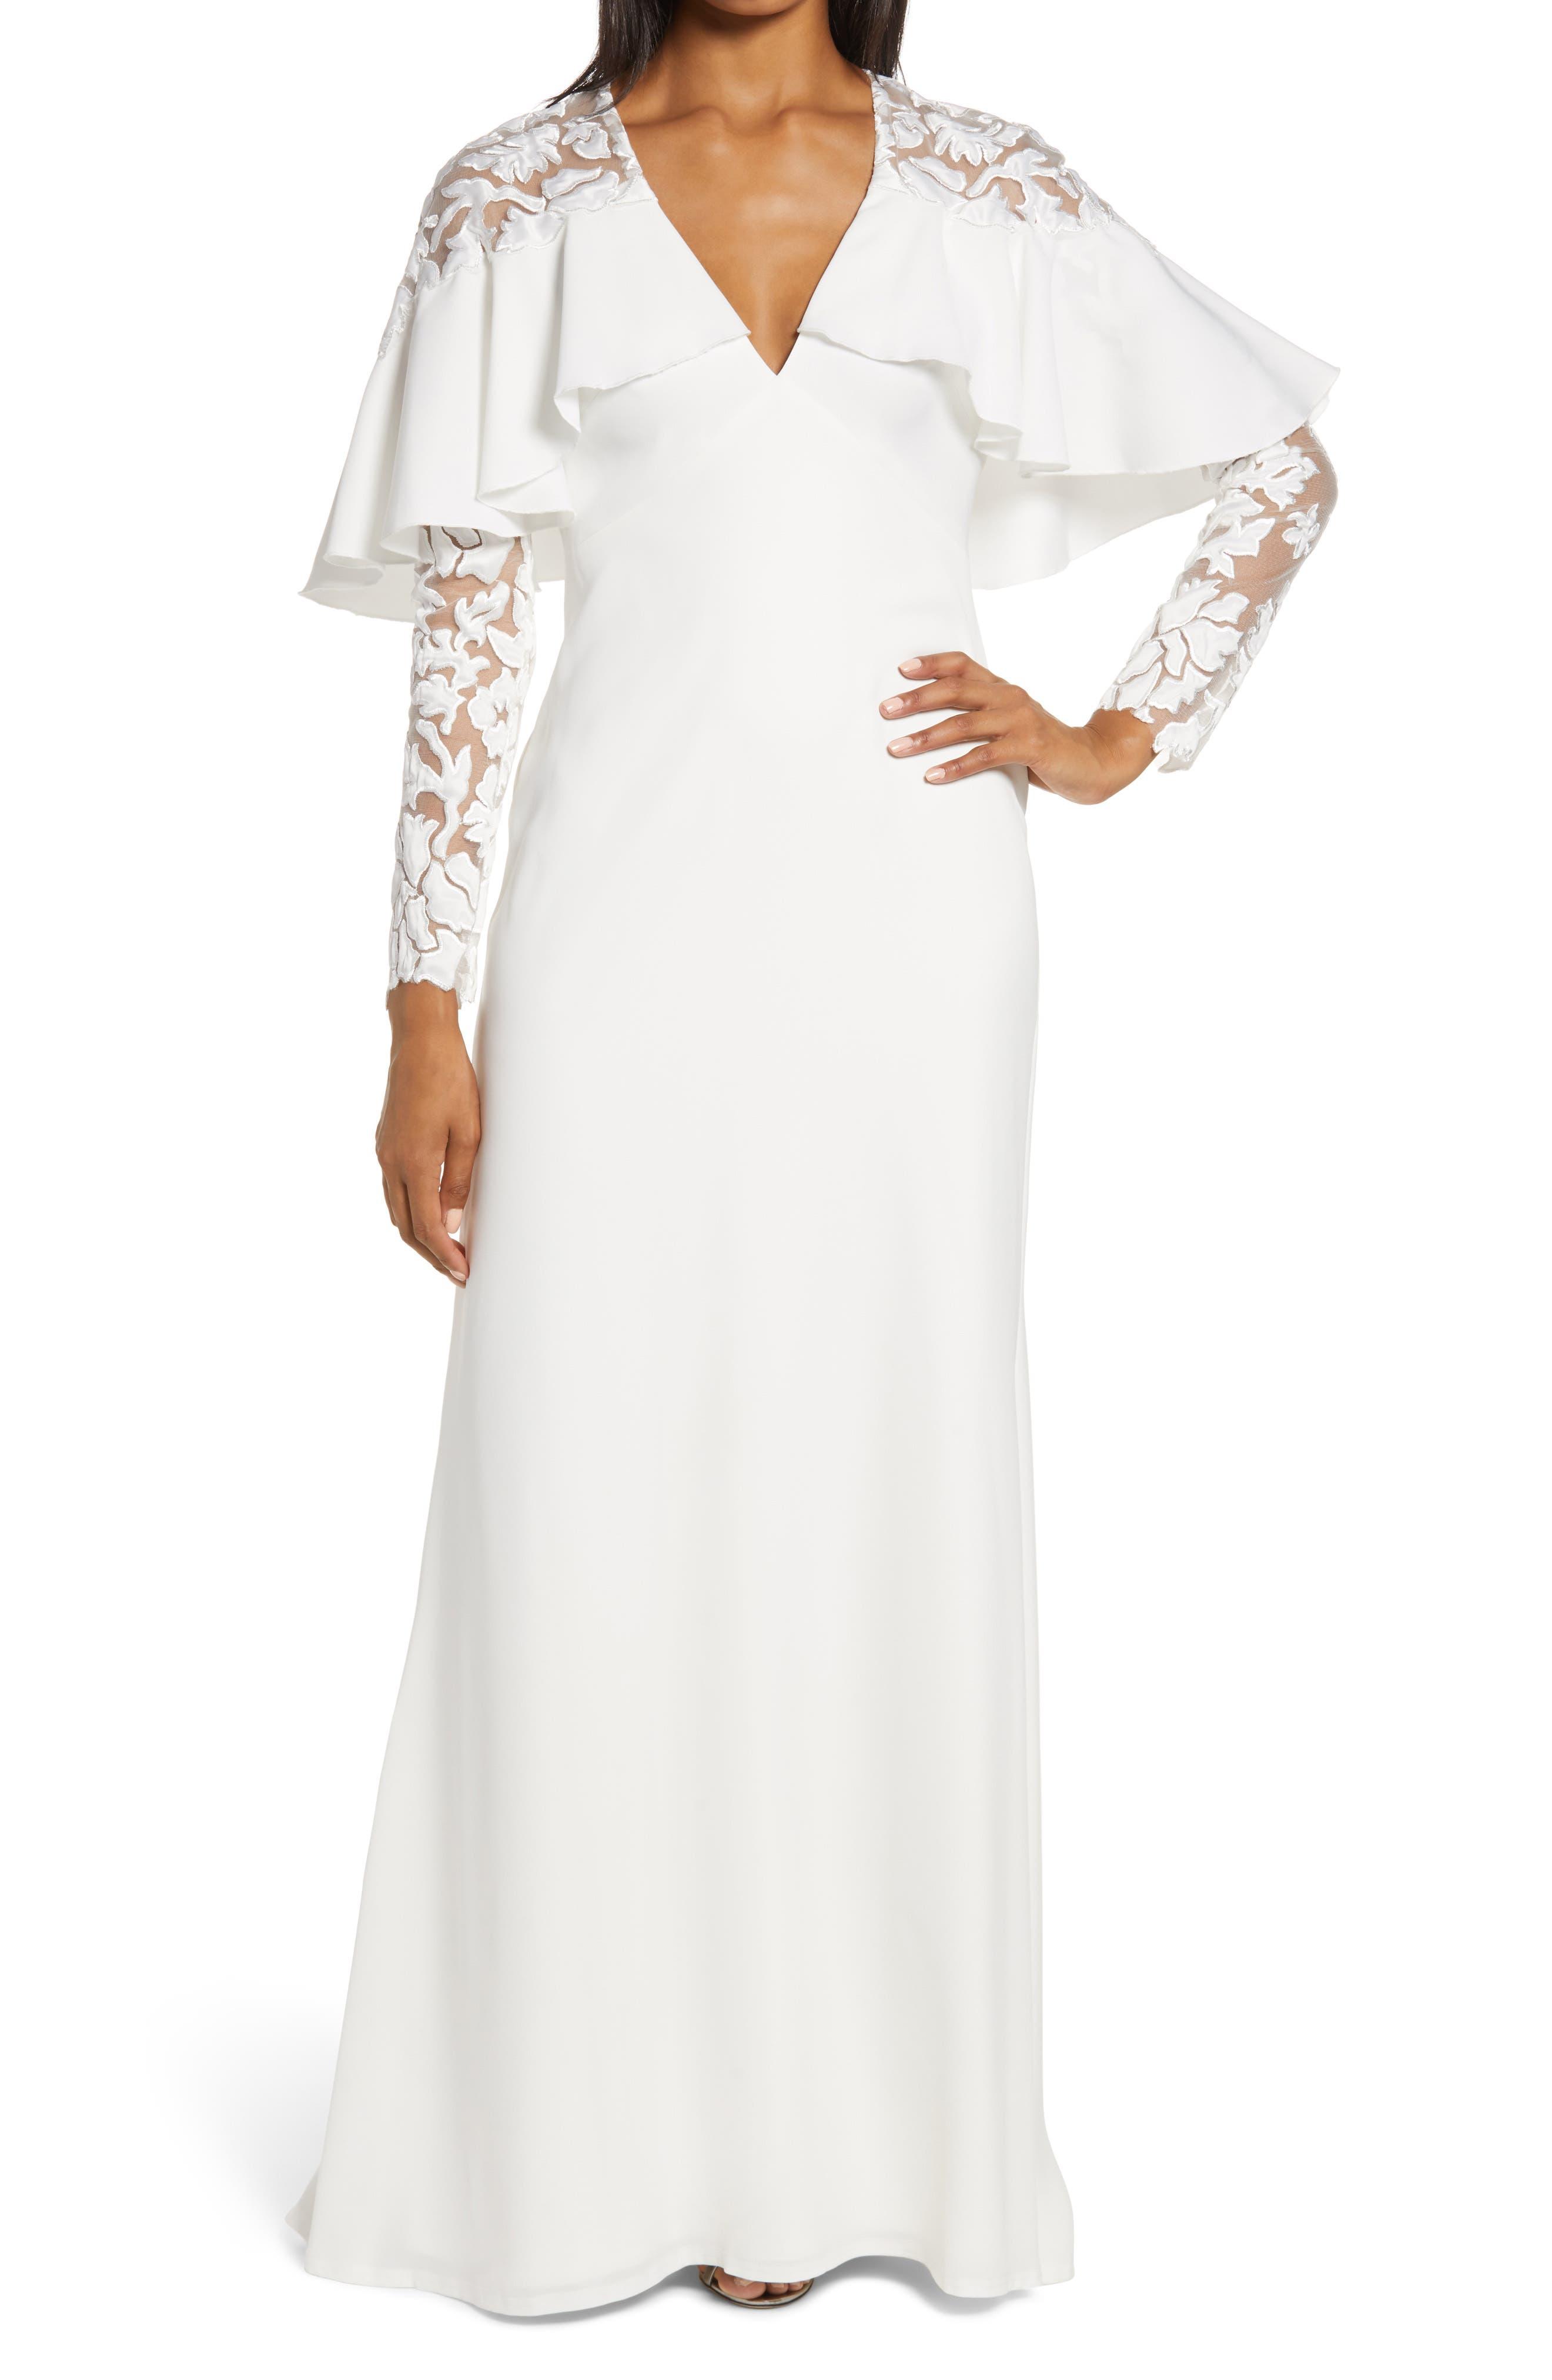 60s Wedding Dresses | 70s Wedding Dresses Womens Tadashi Shoji Capelet Long Sleeve Fit  Flare Gown $598.00 AT vintagedancer.com